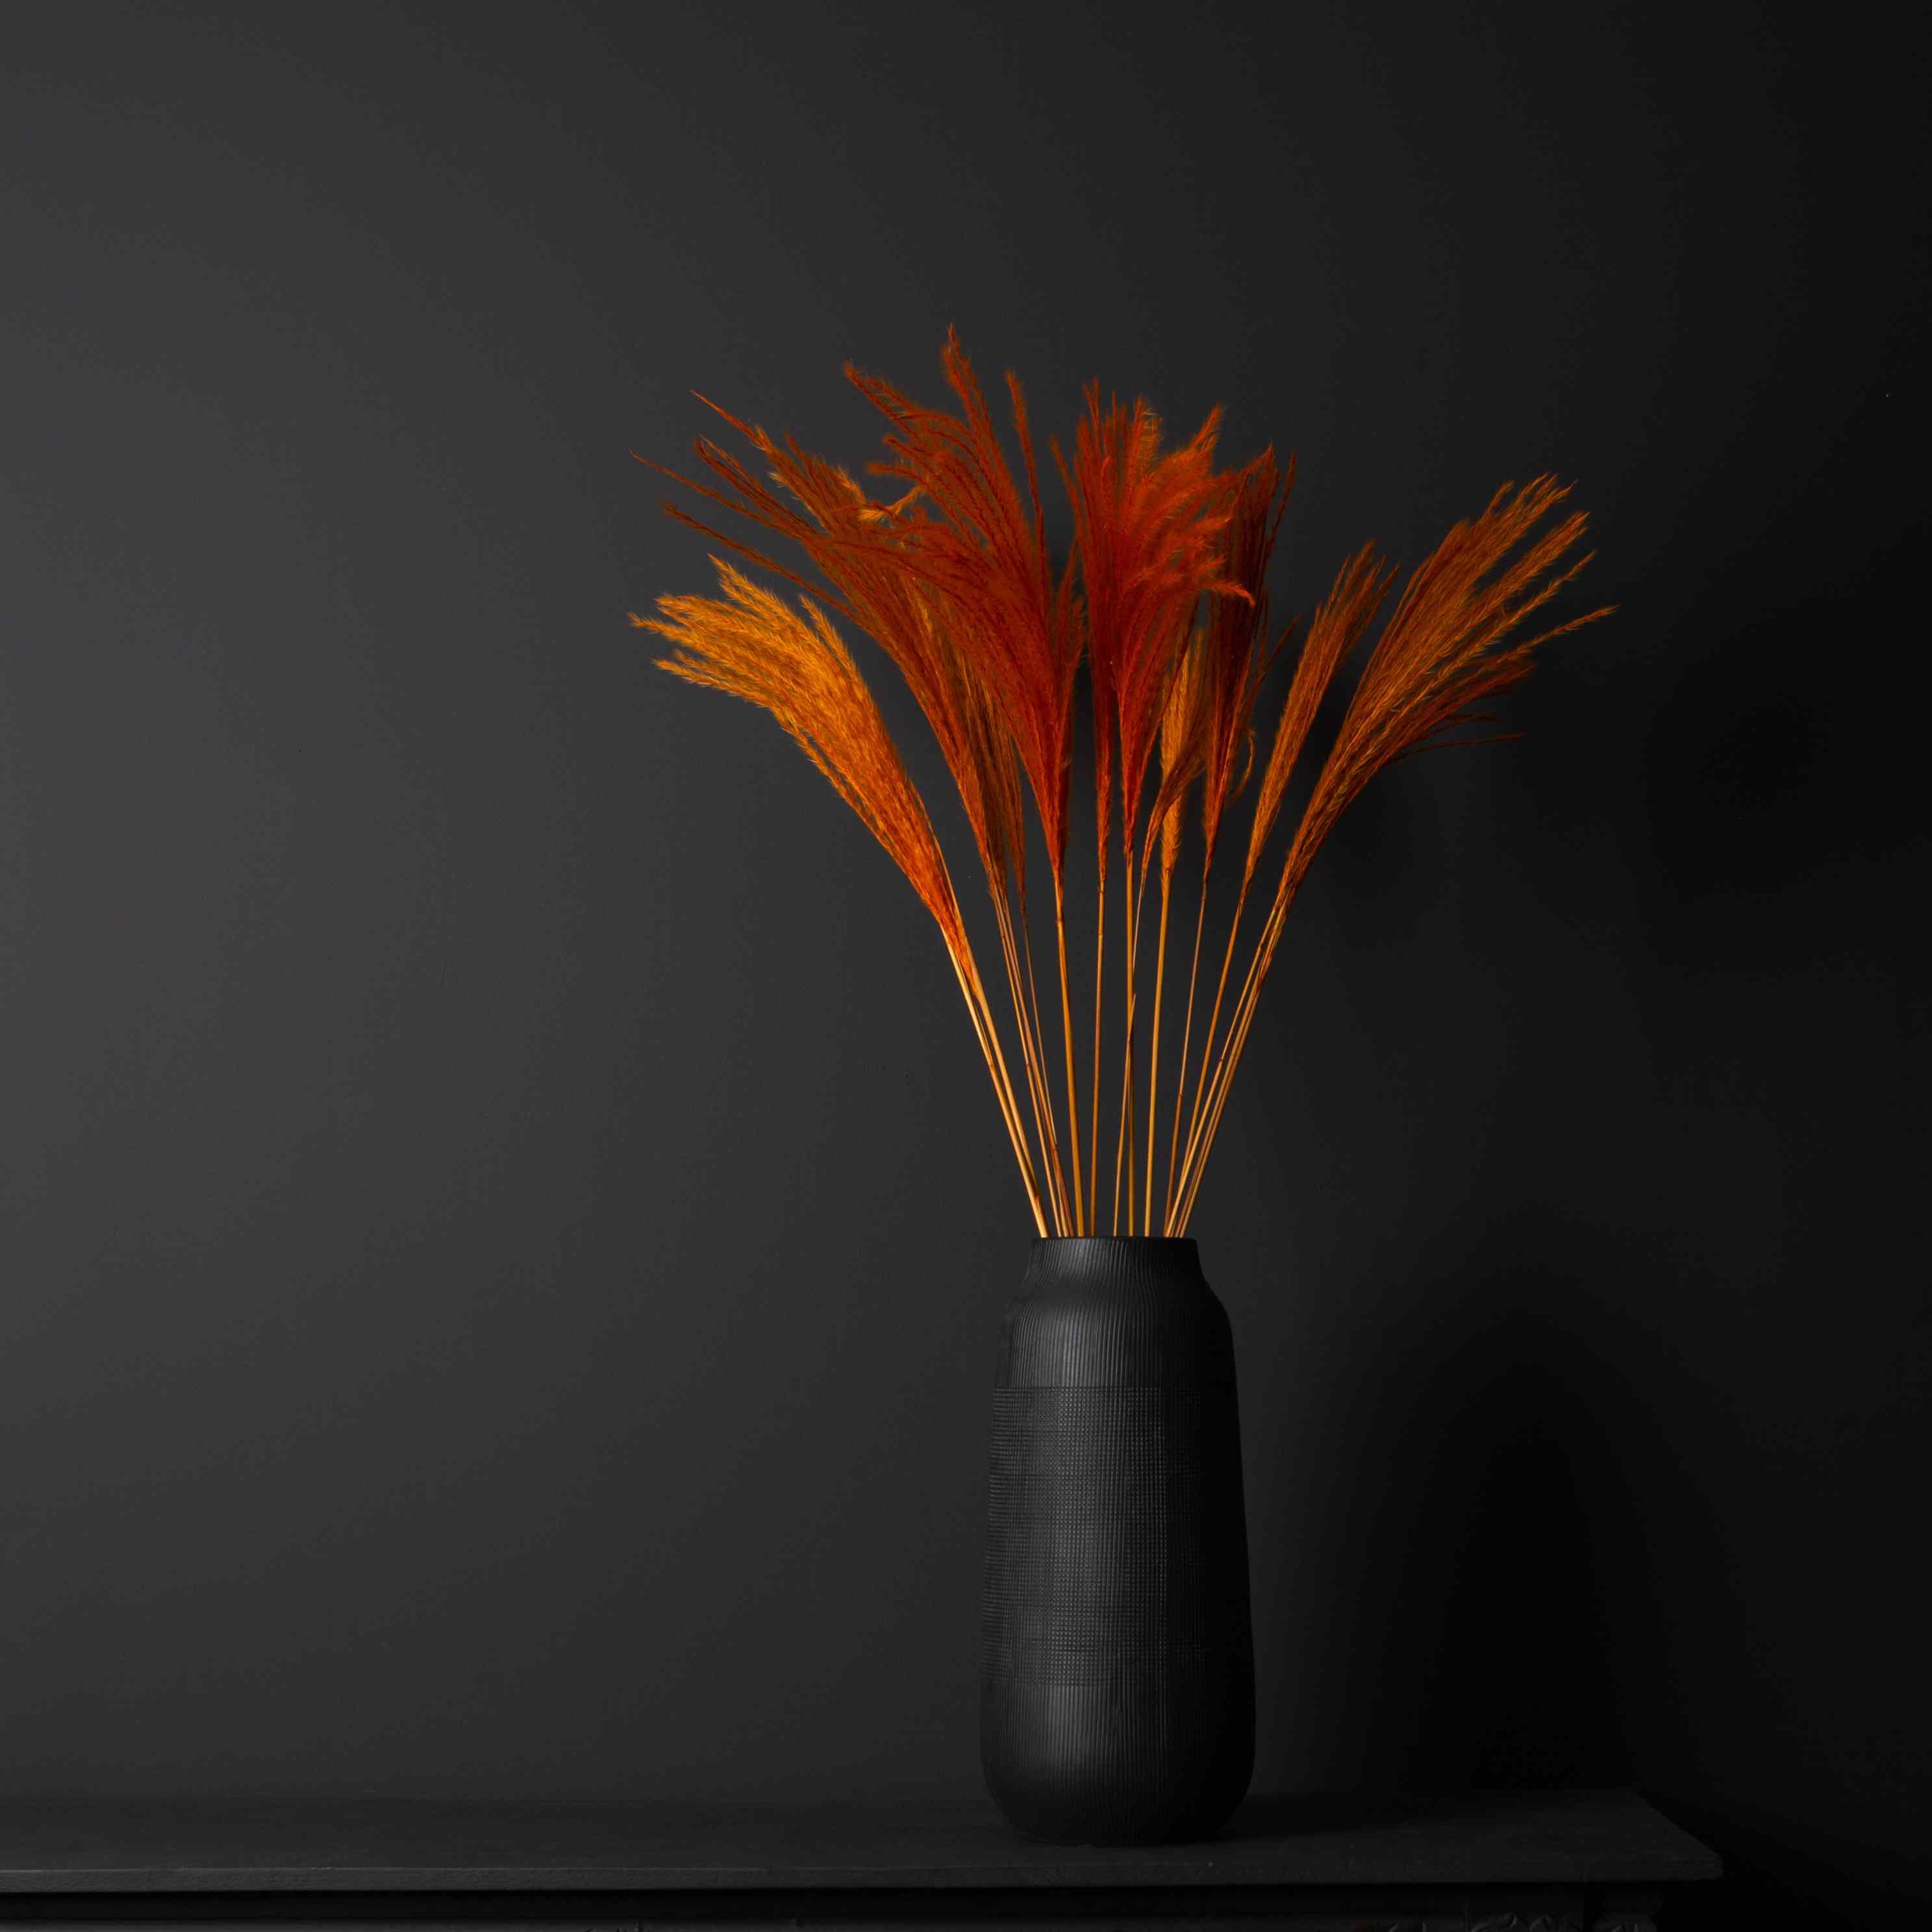 orange strip feathers for fall decor